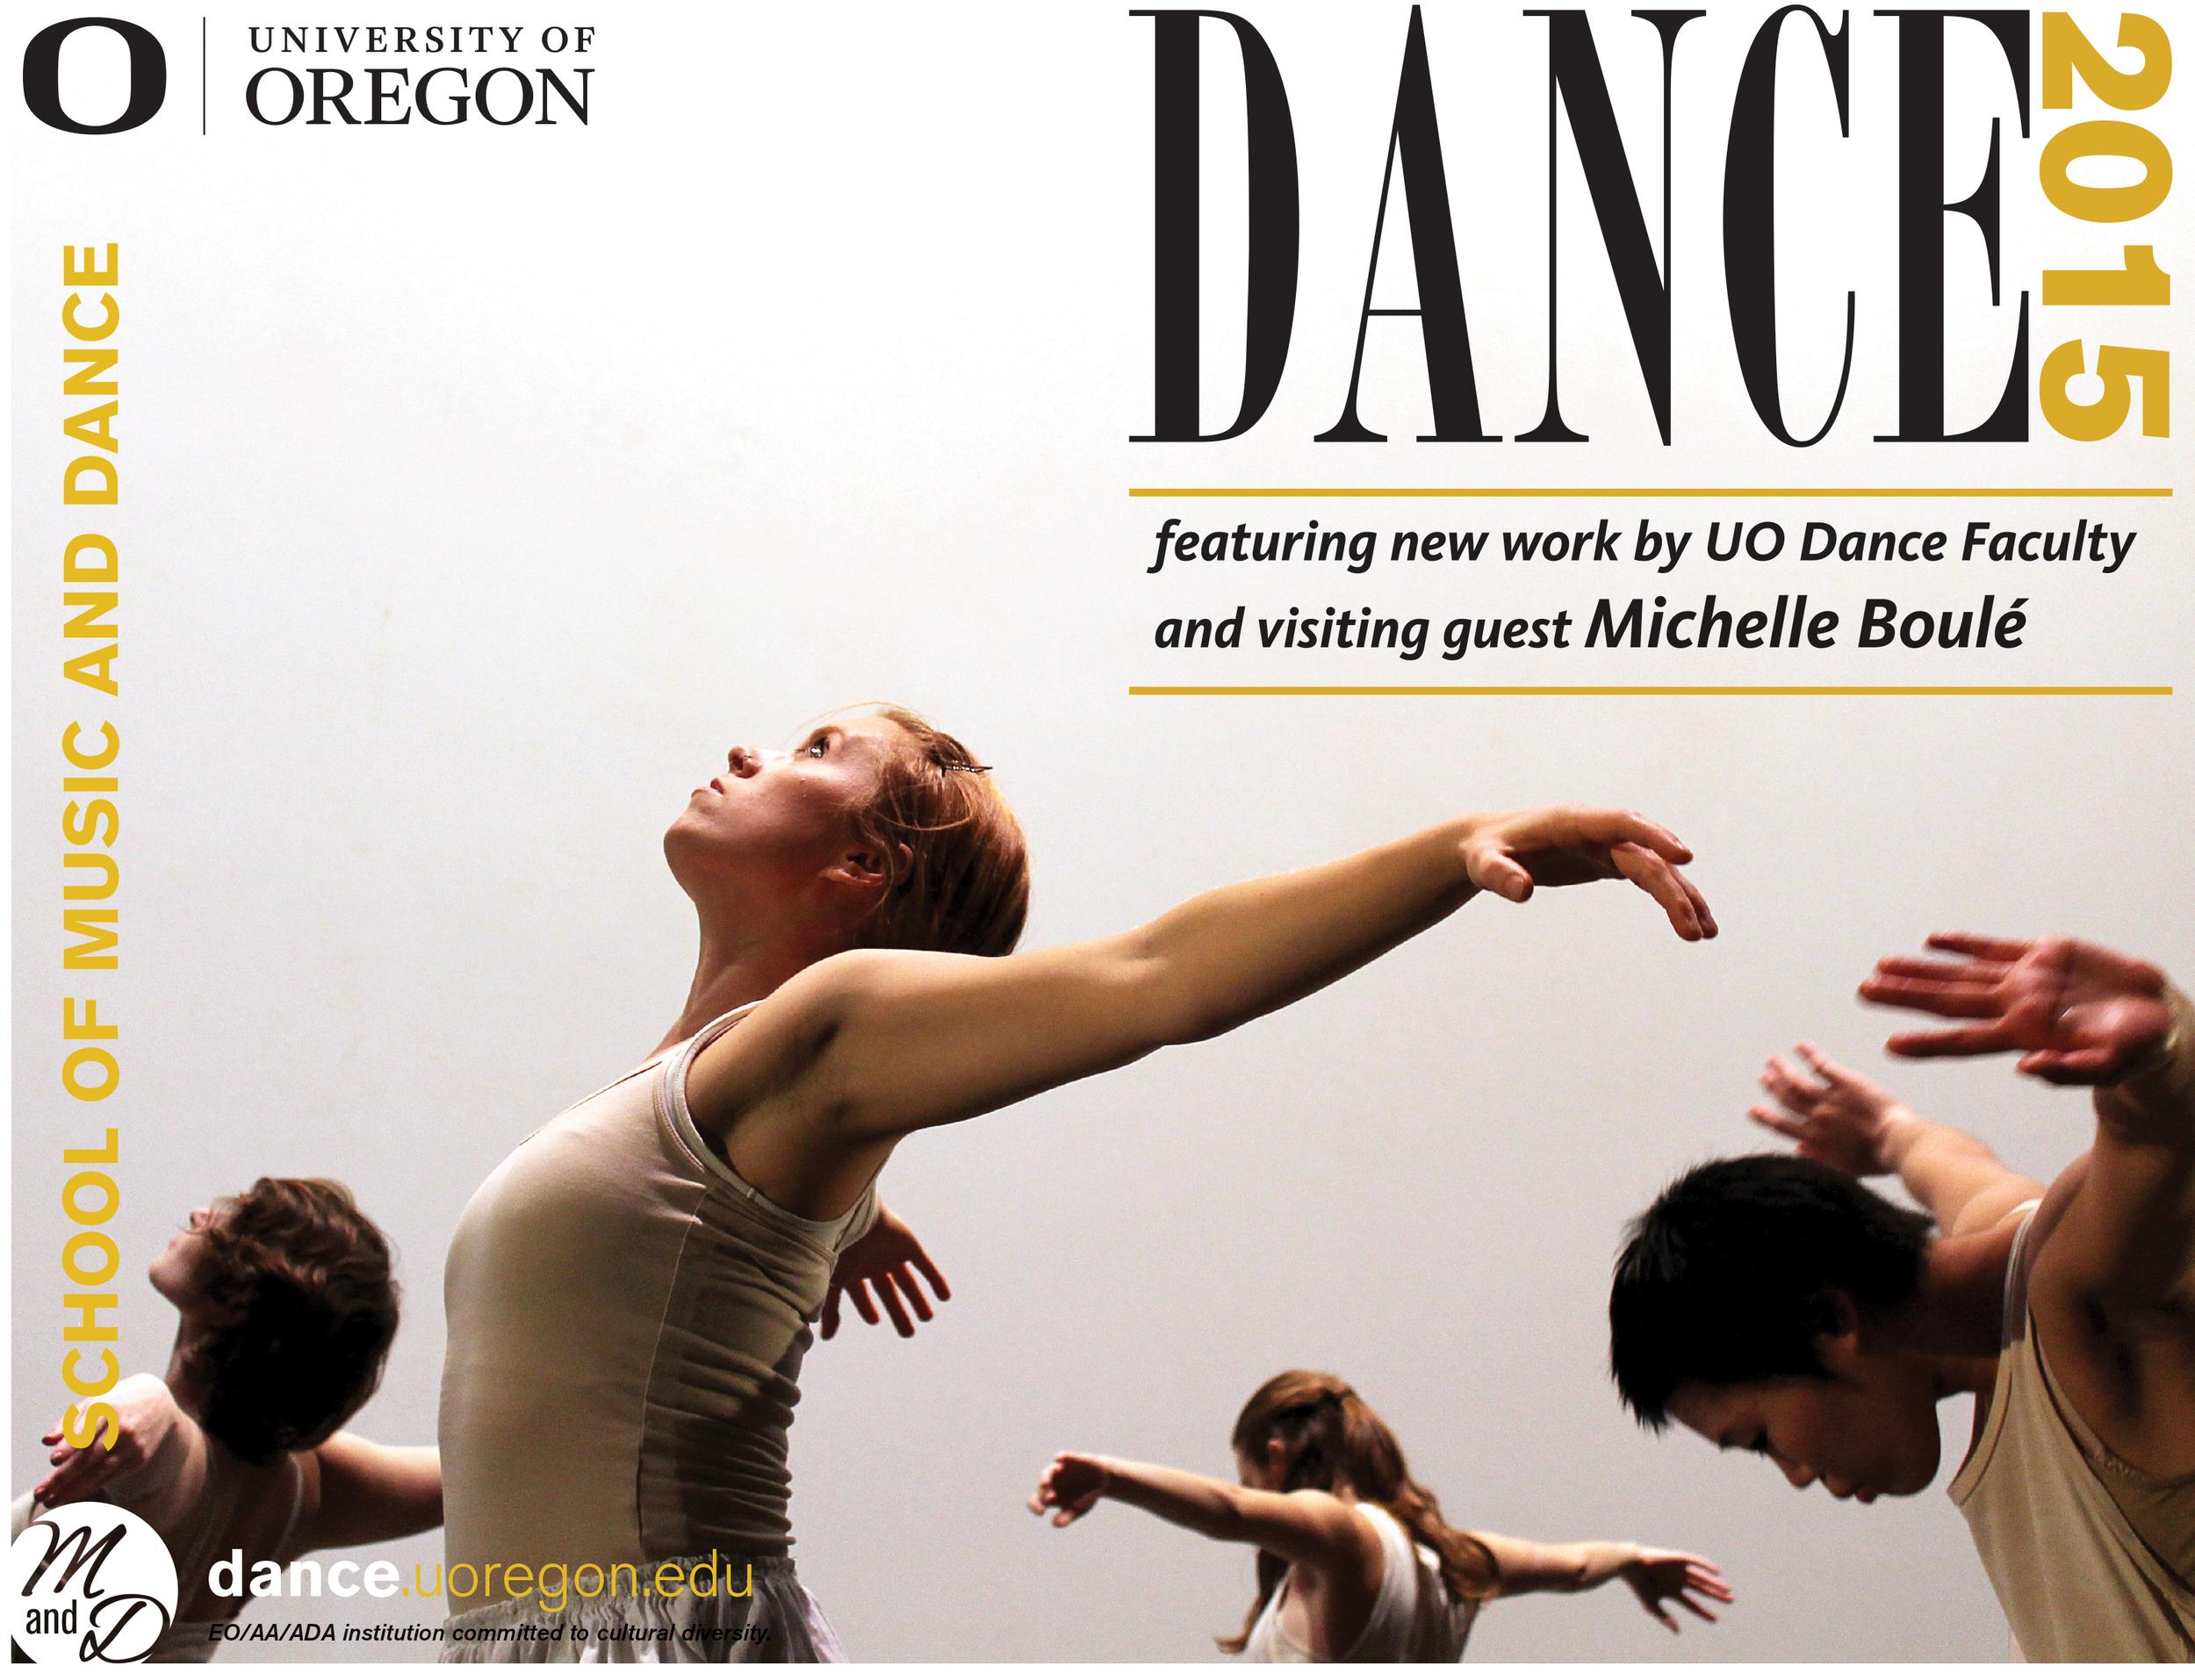 faculty-dance-cover.jpg